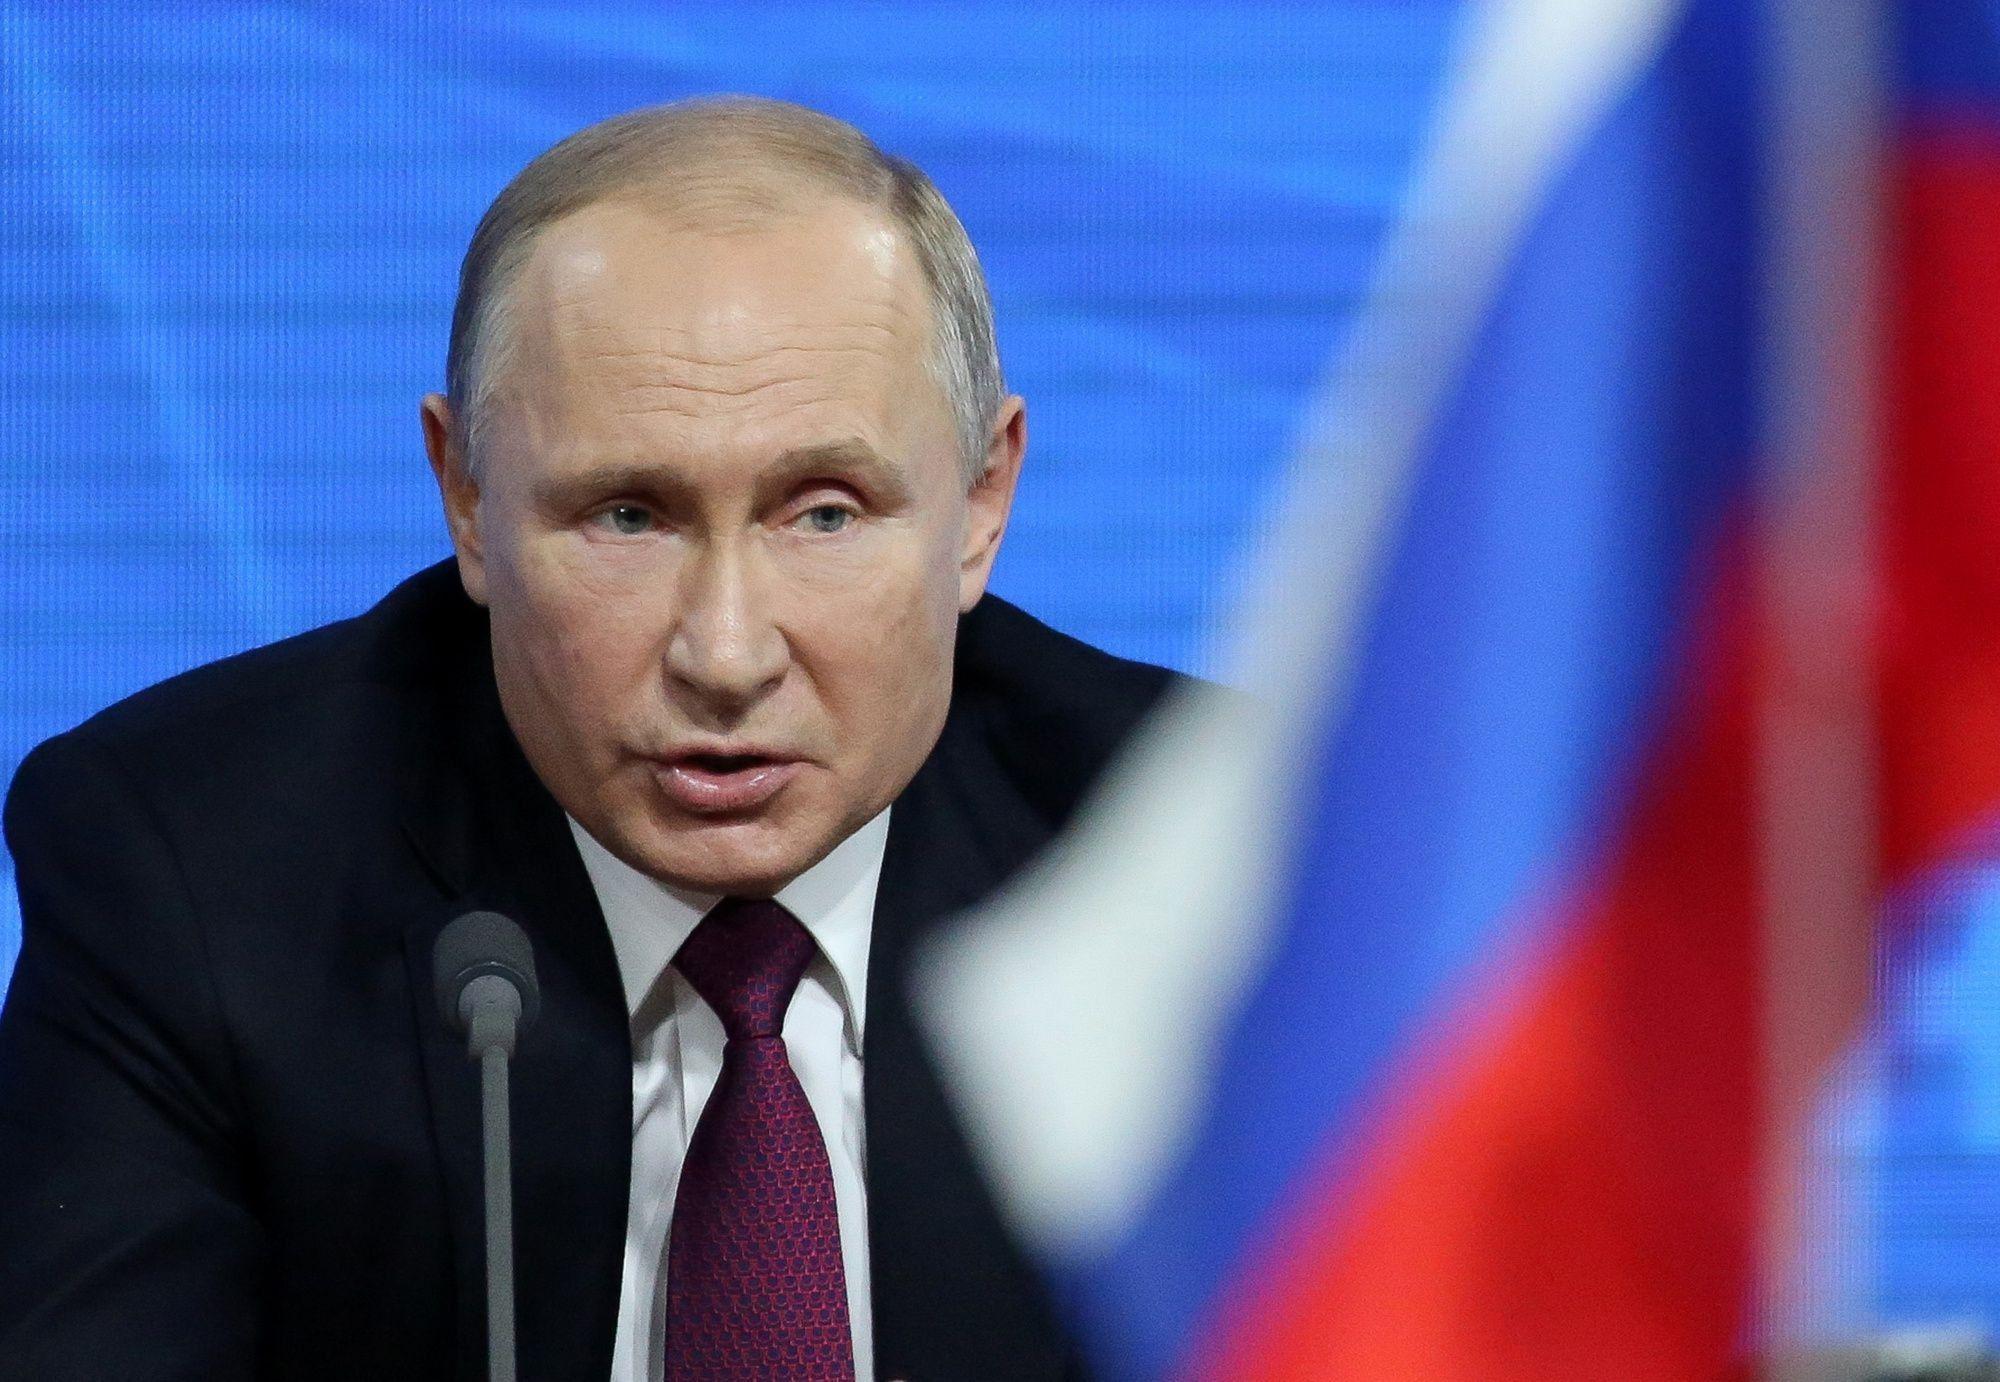 Russia's President Vladimir Putin's Annual News Conference